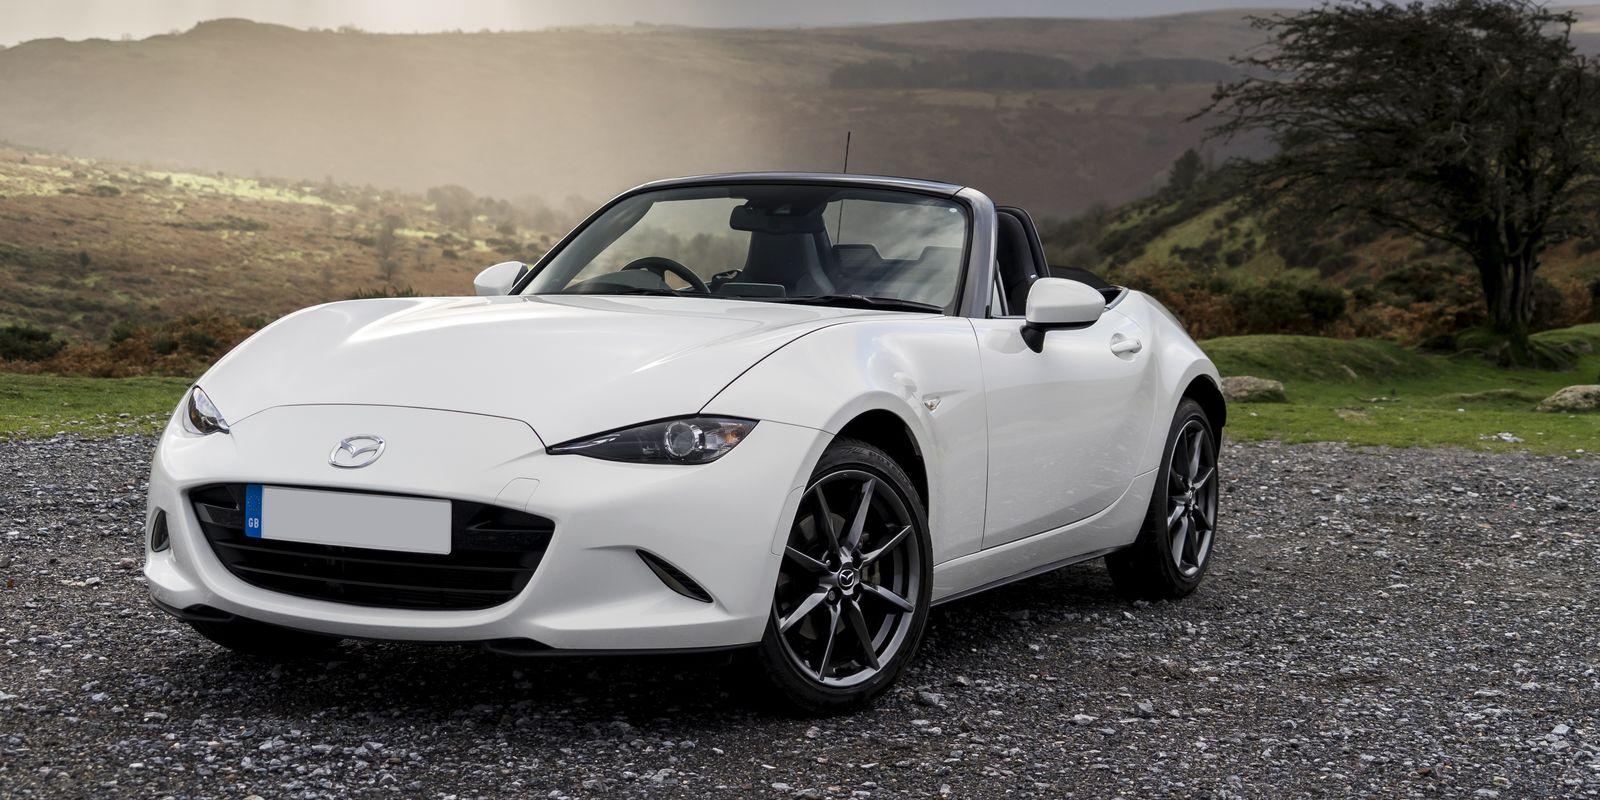 Best New Cars Under 15000 >> Cheapest Safest New Cars | Autos Post